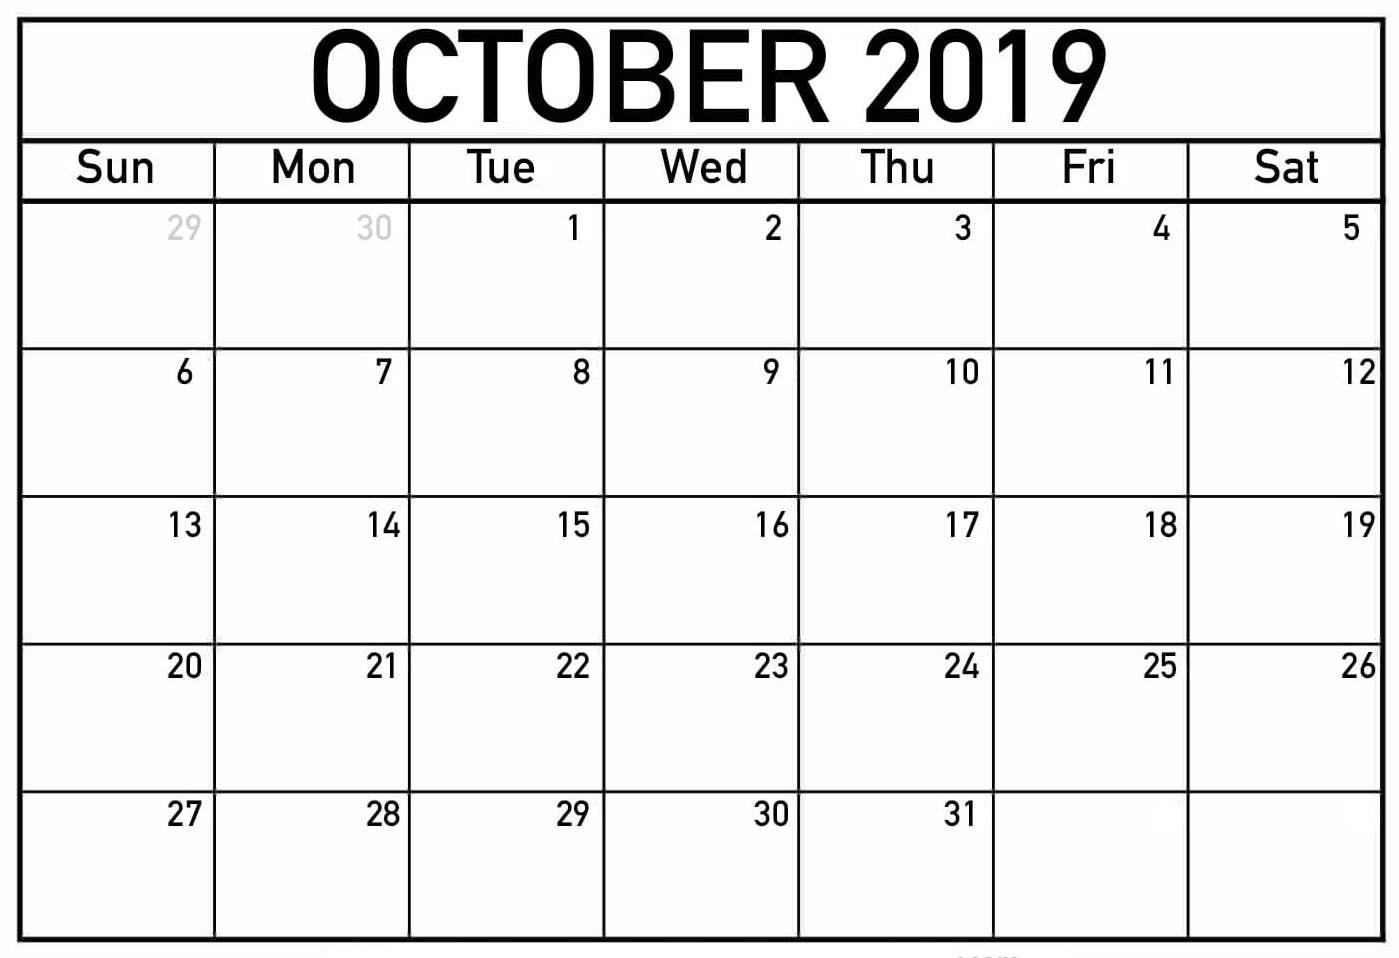 Fillable Calendar for October 2019 Printable Template